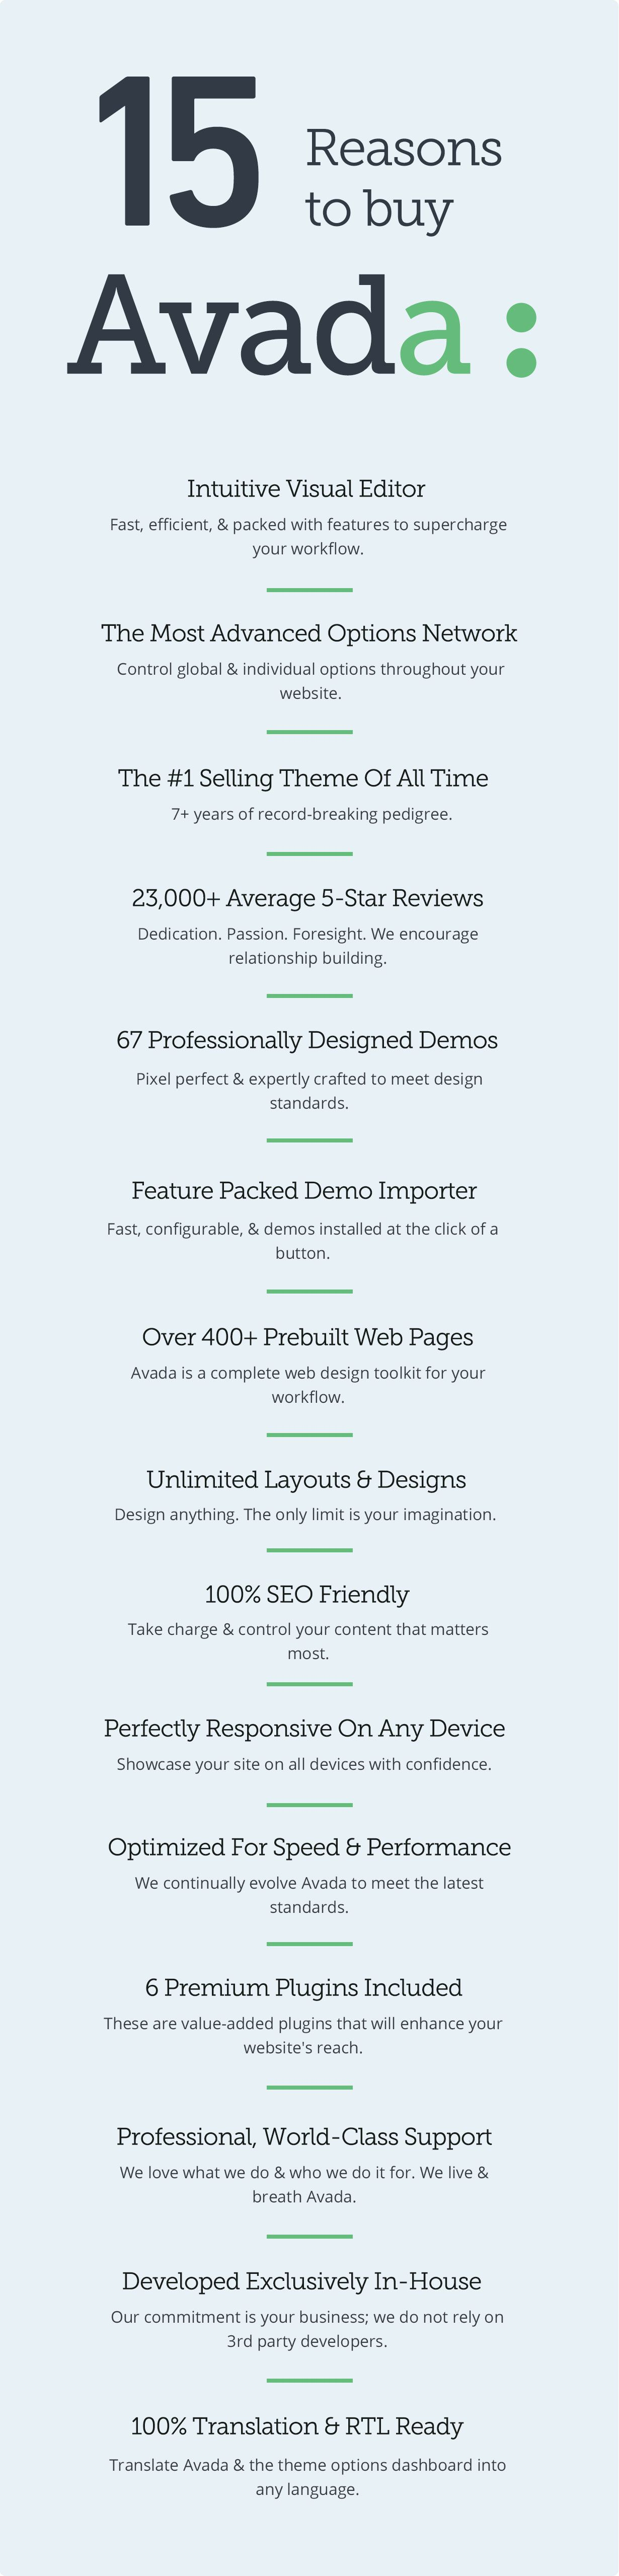 Avada | Website Builder For WordPress & WooCommerce - 31